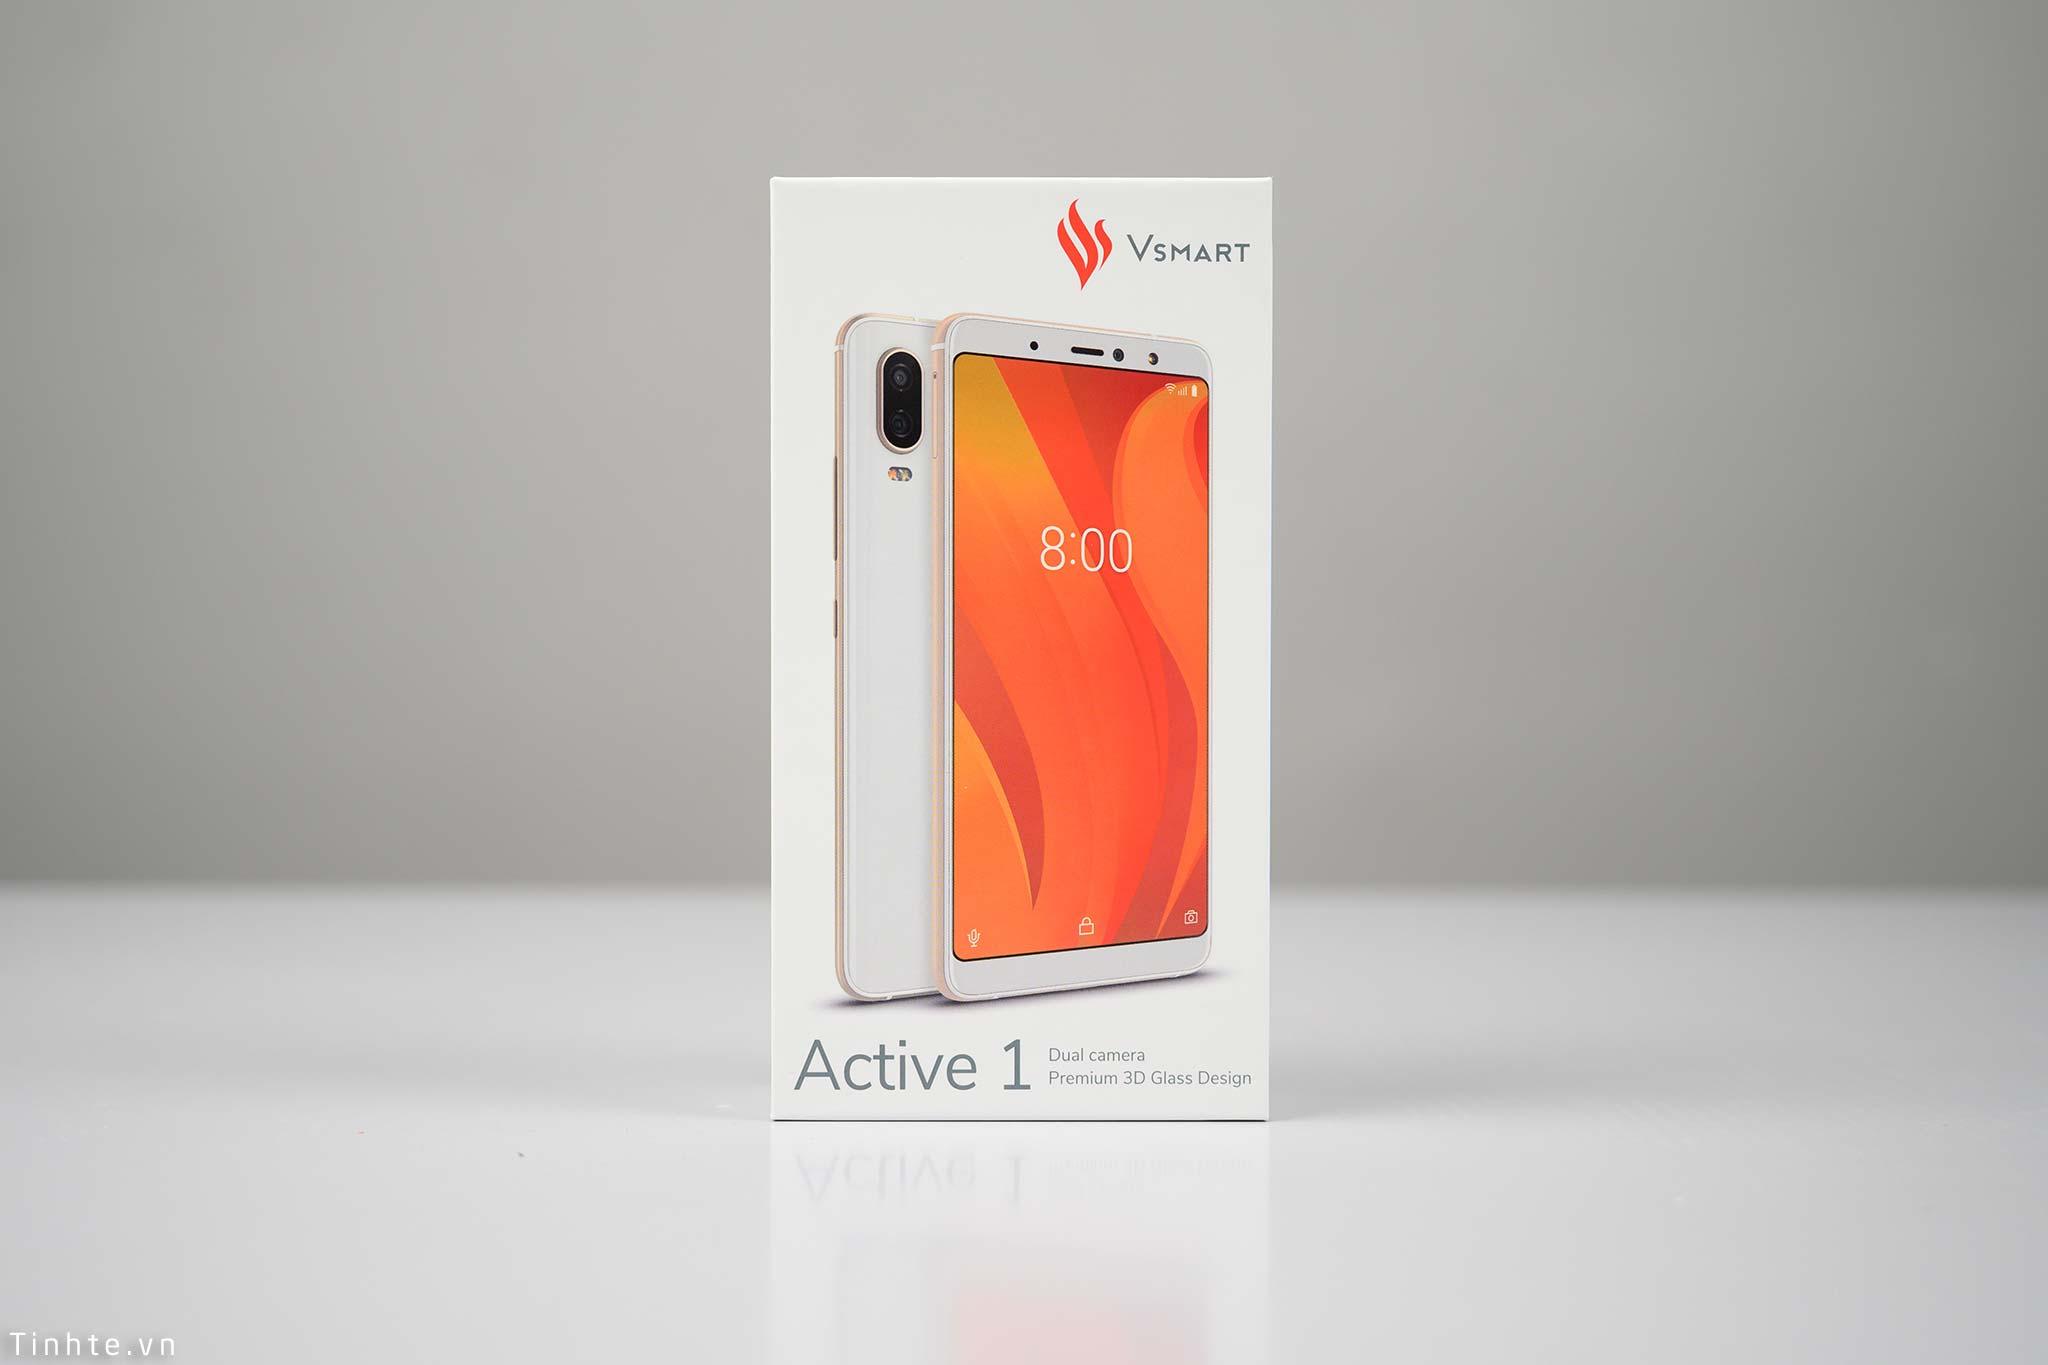 Vsmart_Active_1_TInhte_1.jpg